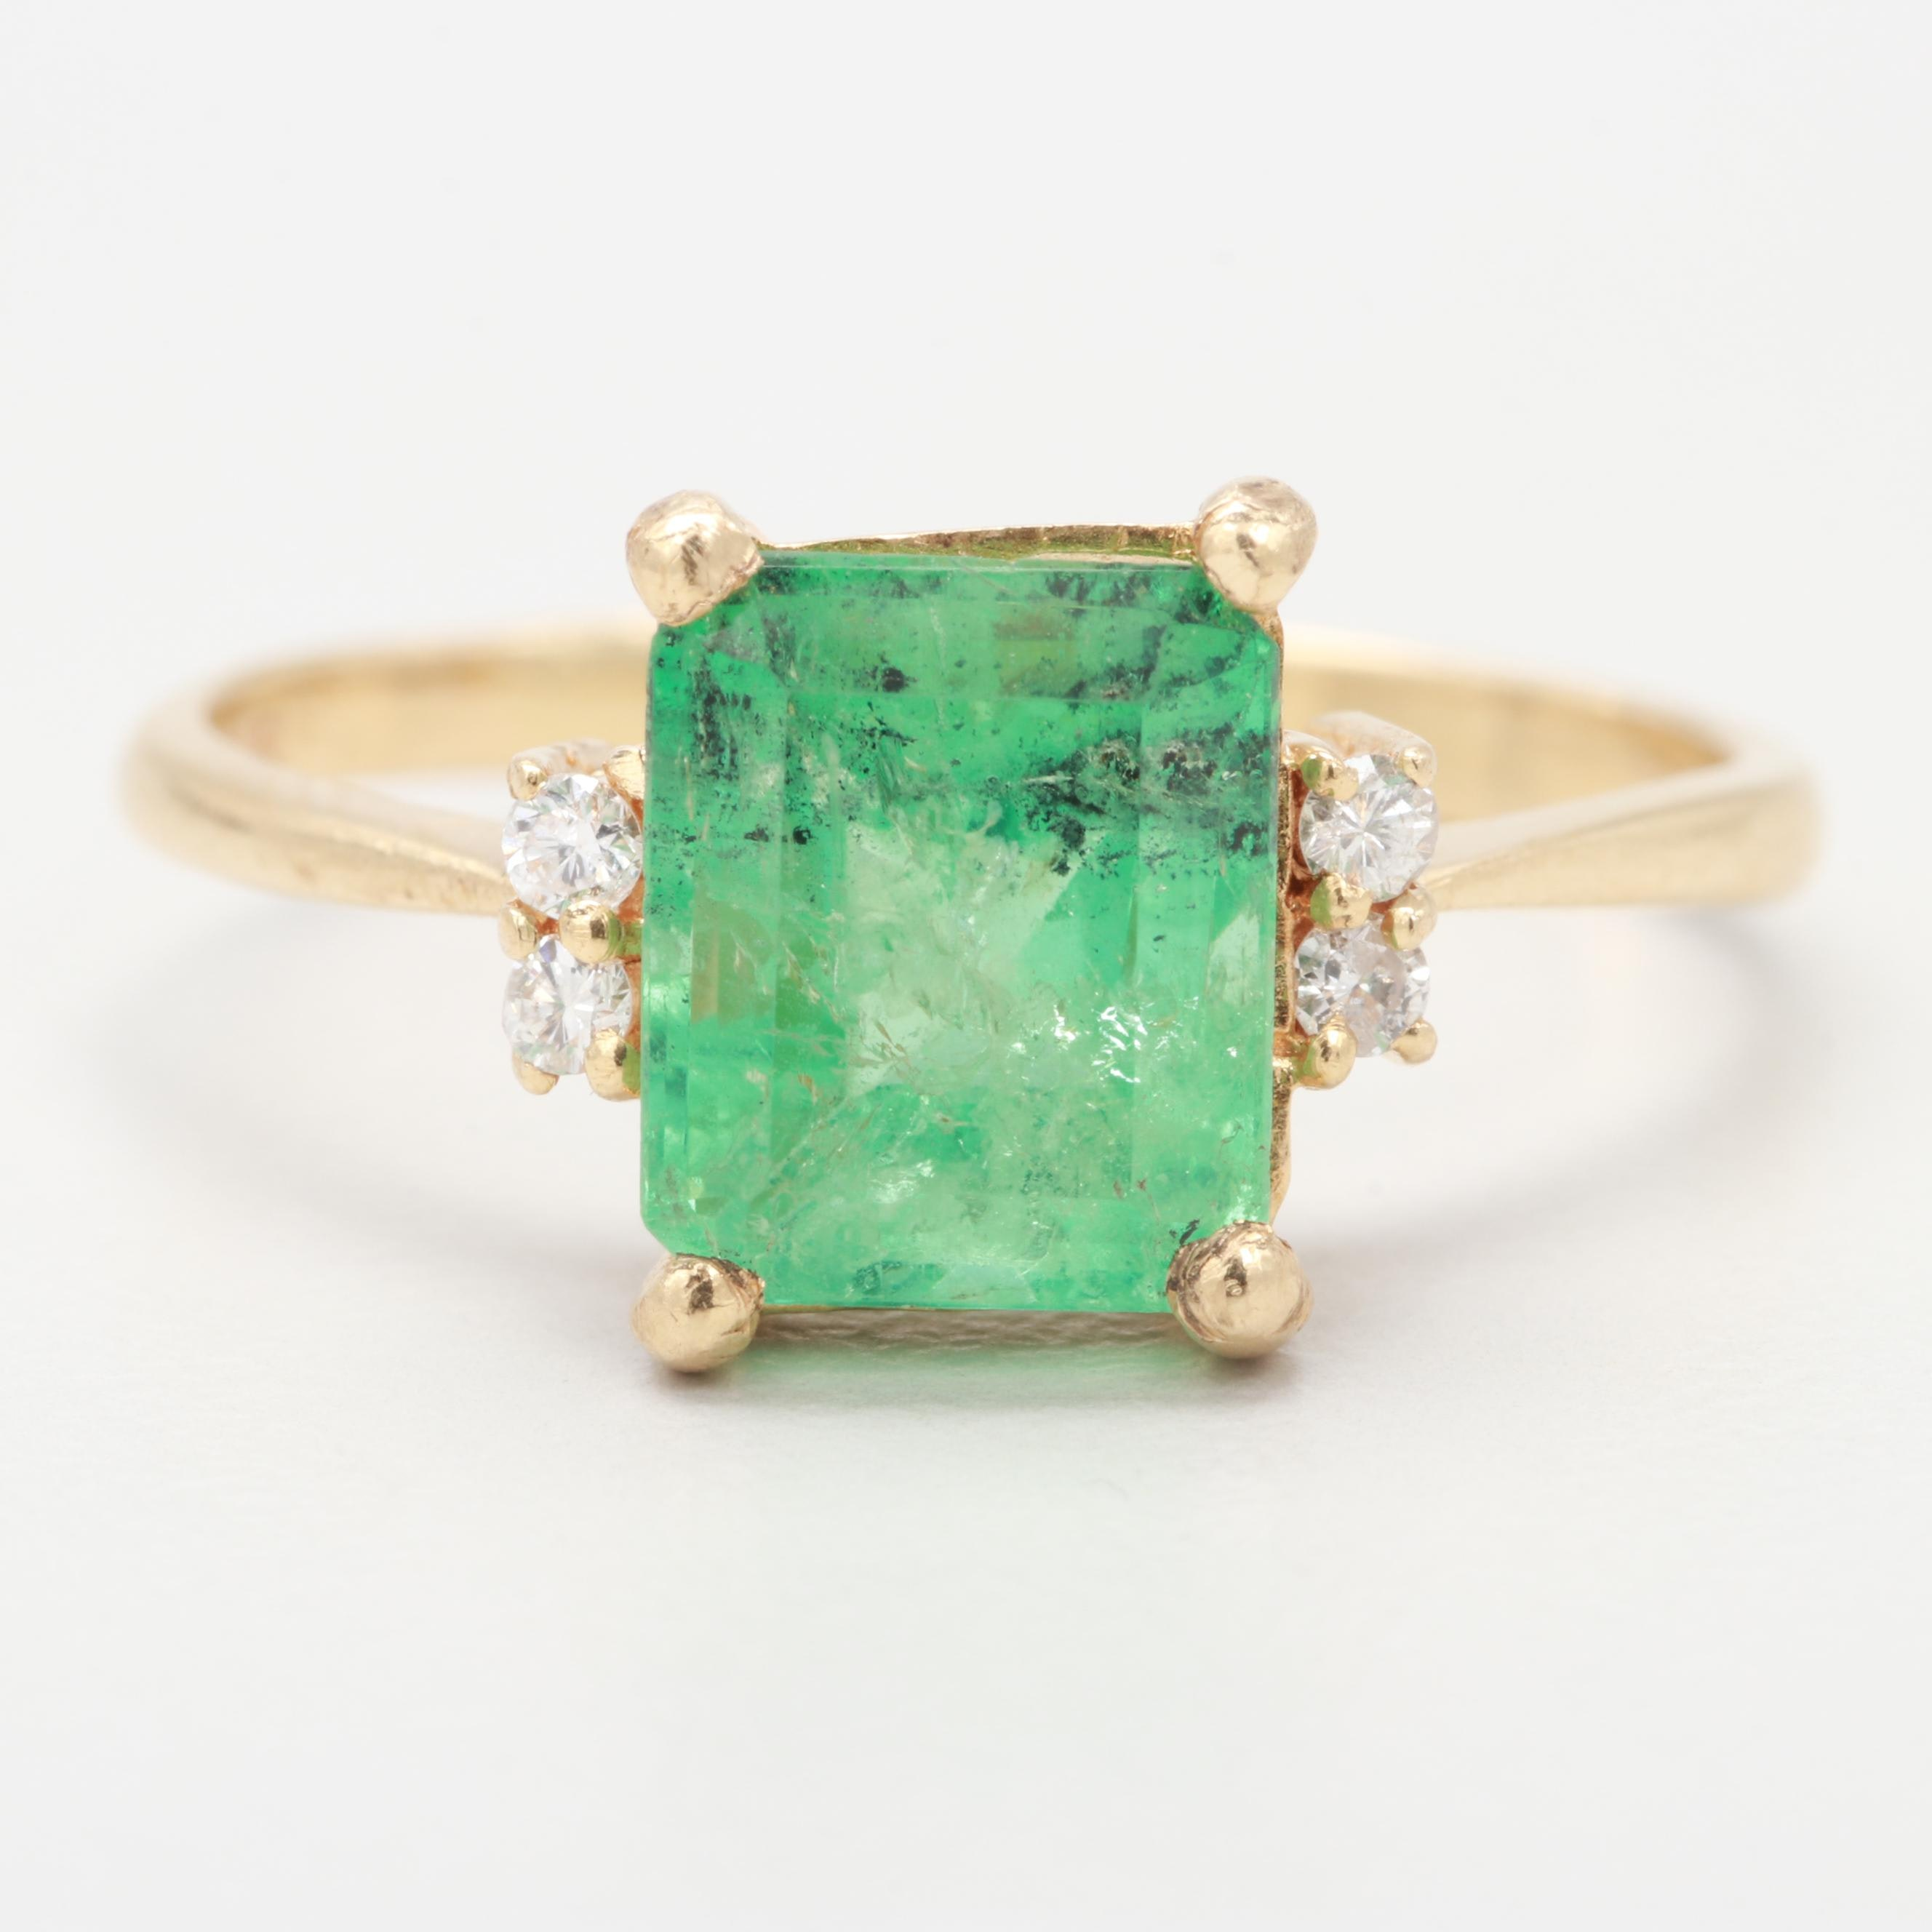 14K Yellow Gold 1.97 CT Emerald and Diamond Ring